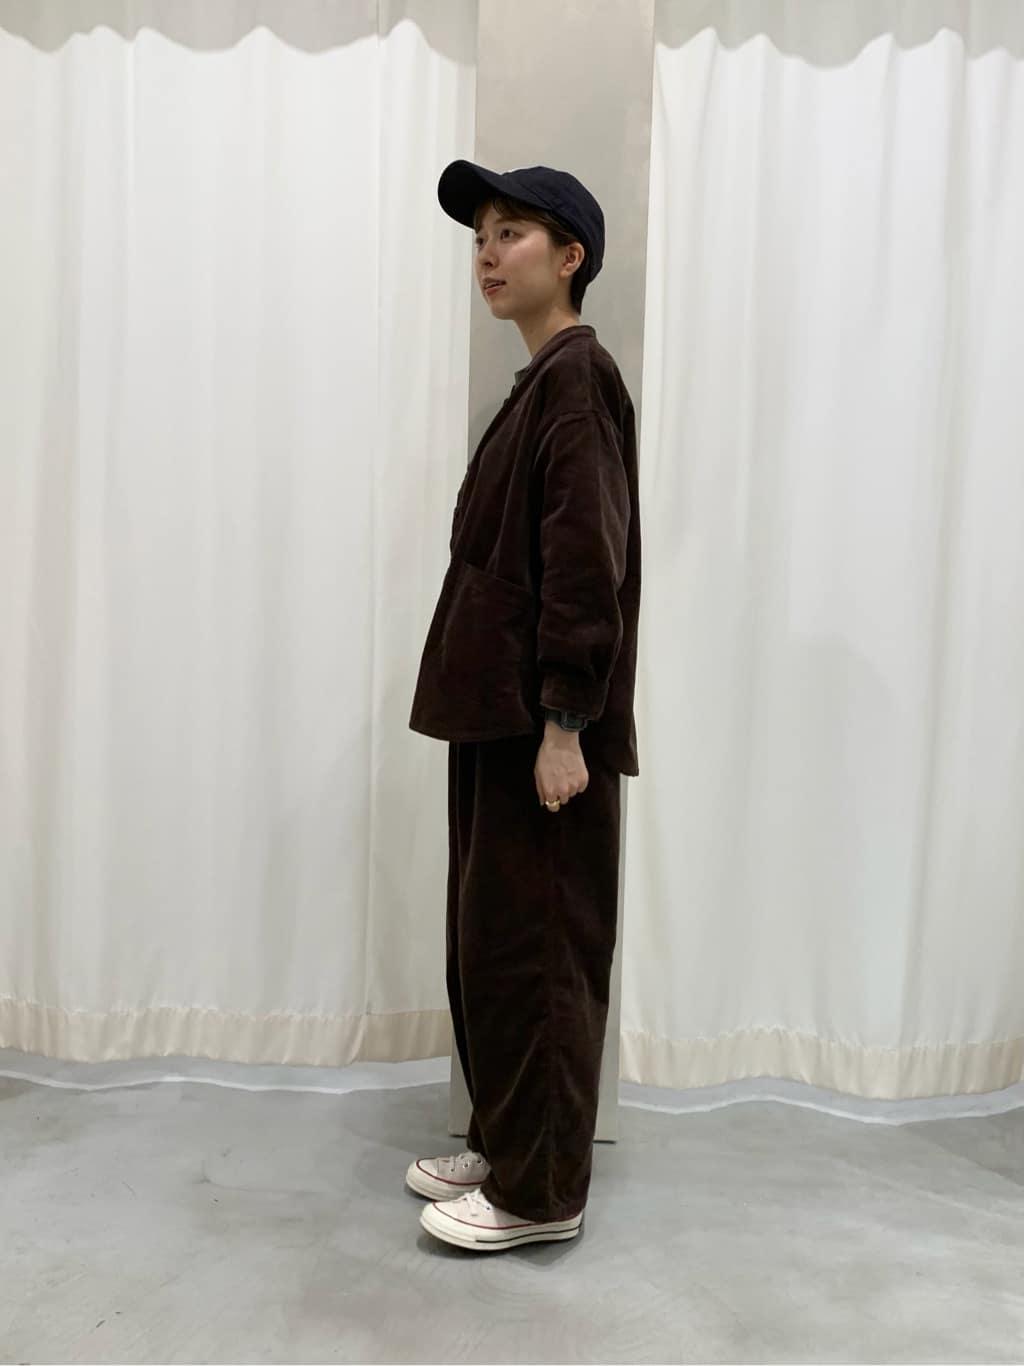 - CHILD WOMAN CHILD WOMAN , PAR ICI ルミネ横浜 身長:158cm 2021.08.19